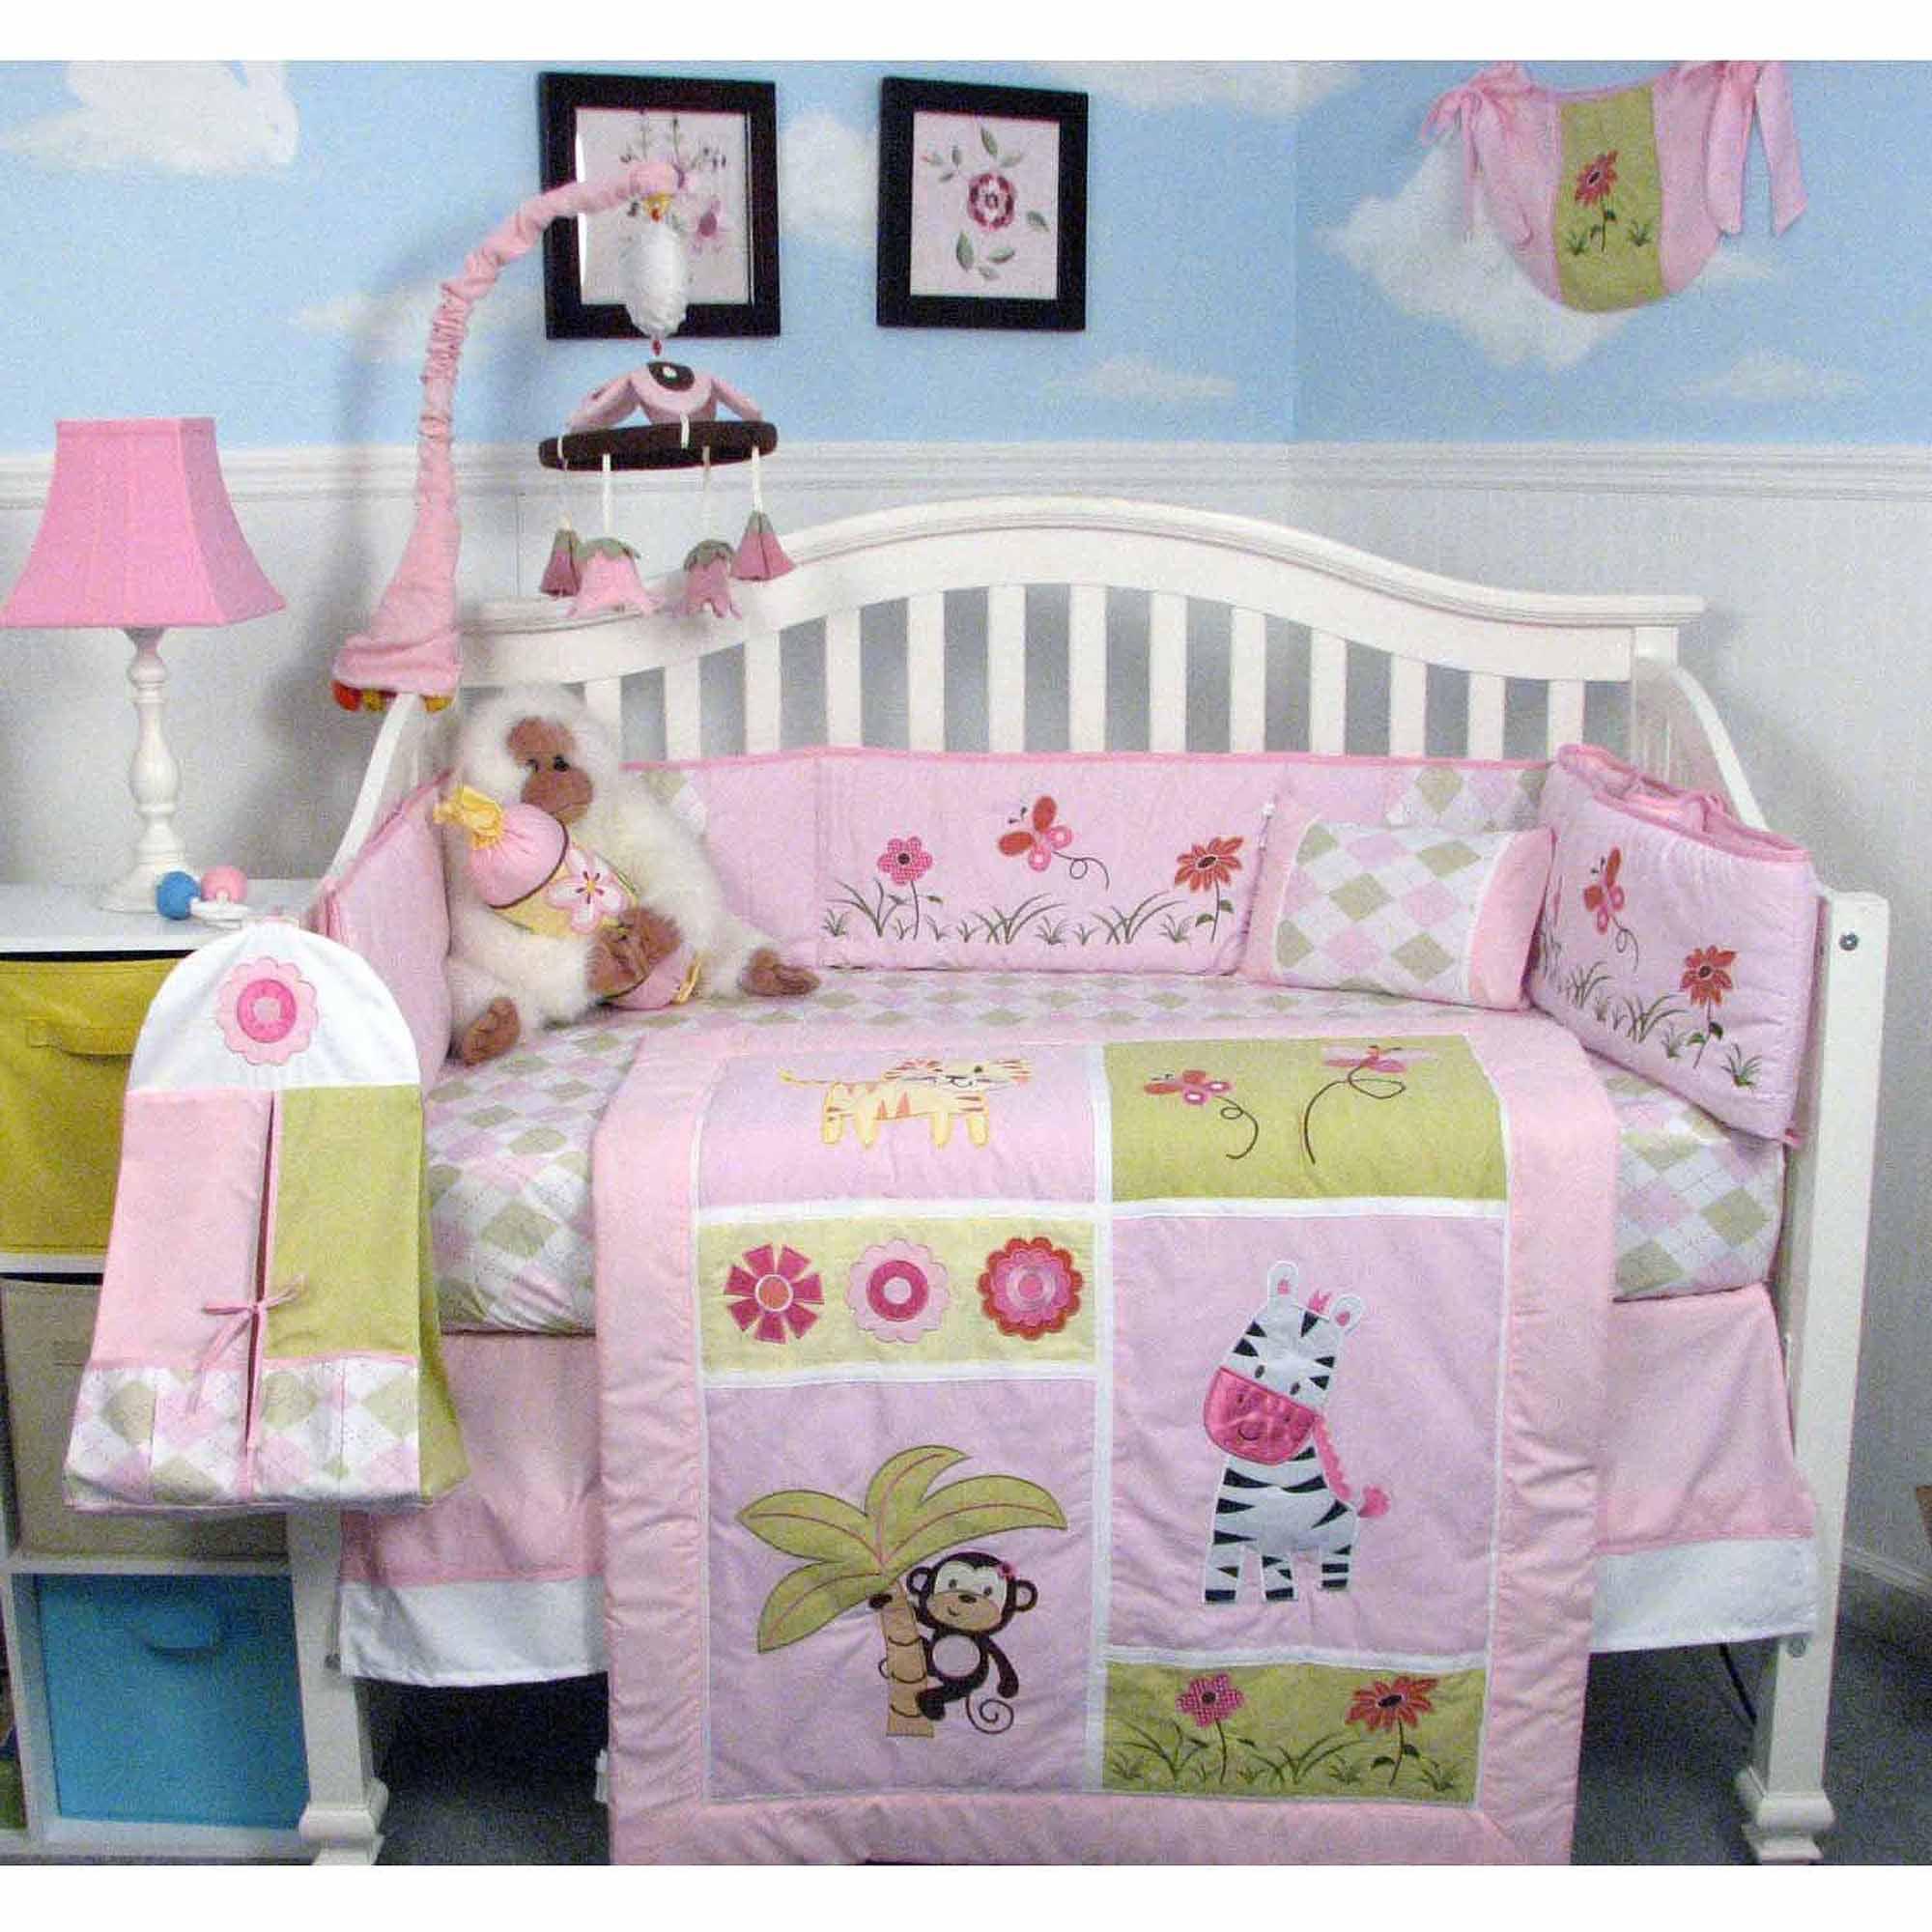 Soho Jelly Bean Jungle Nursery Beddng Set